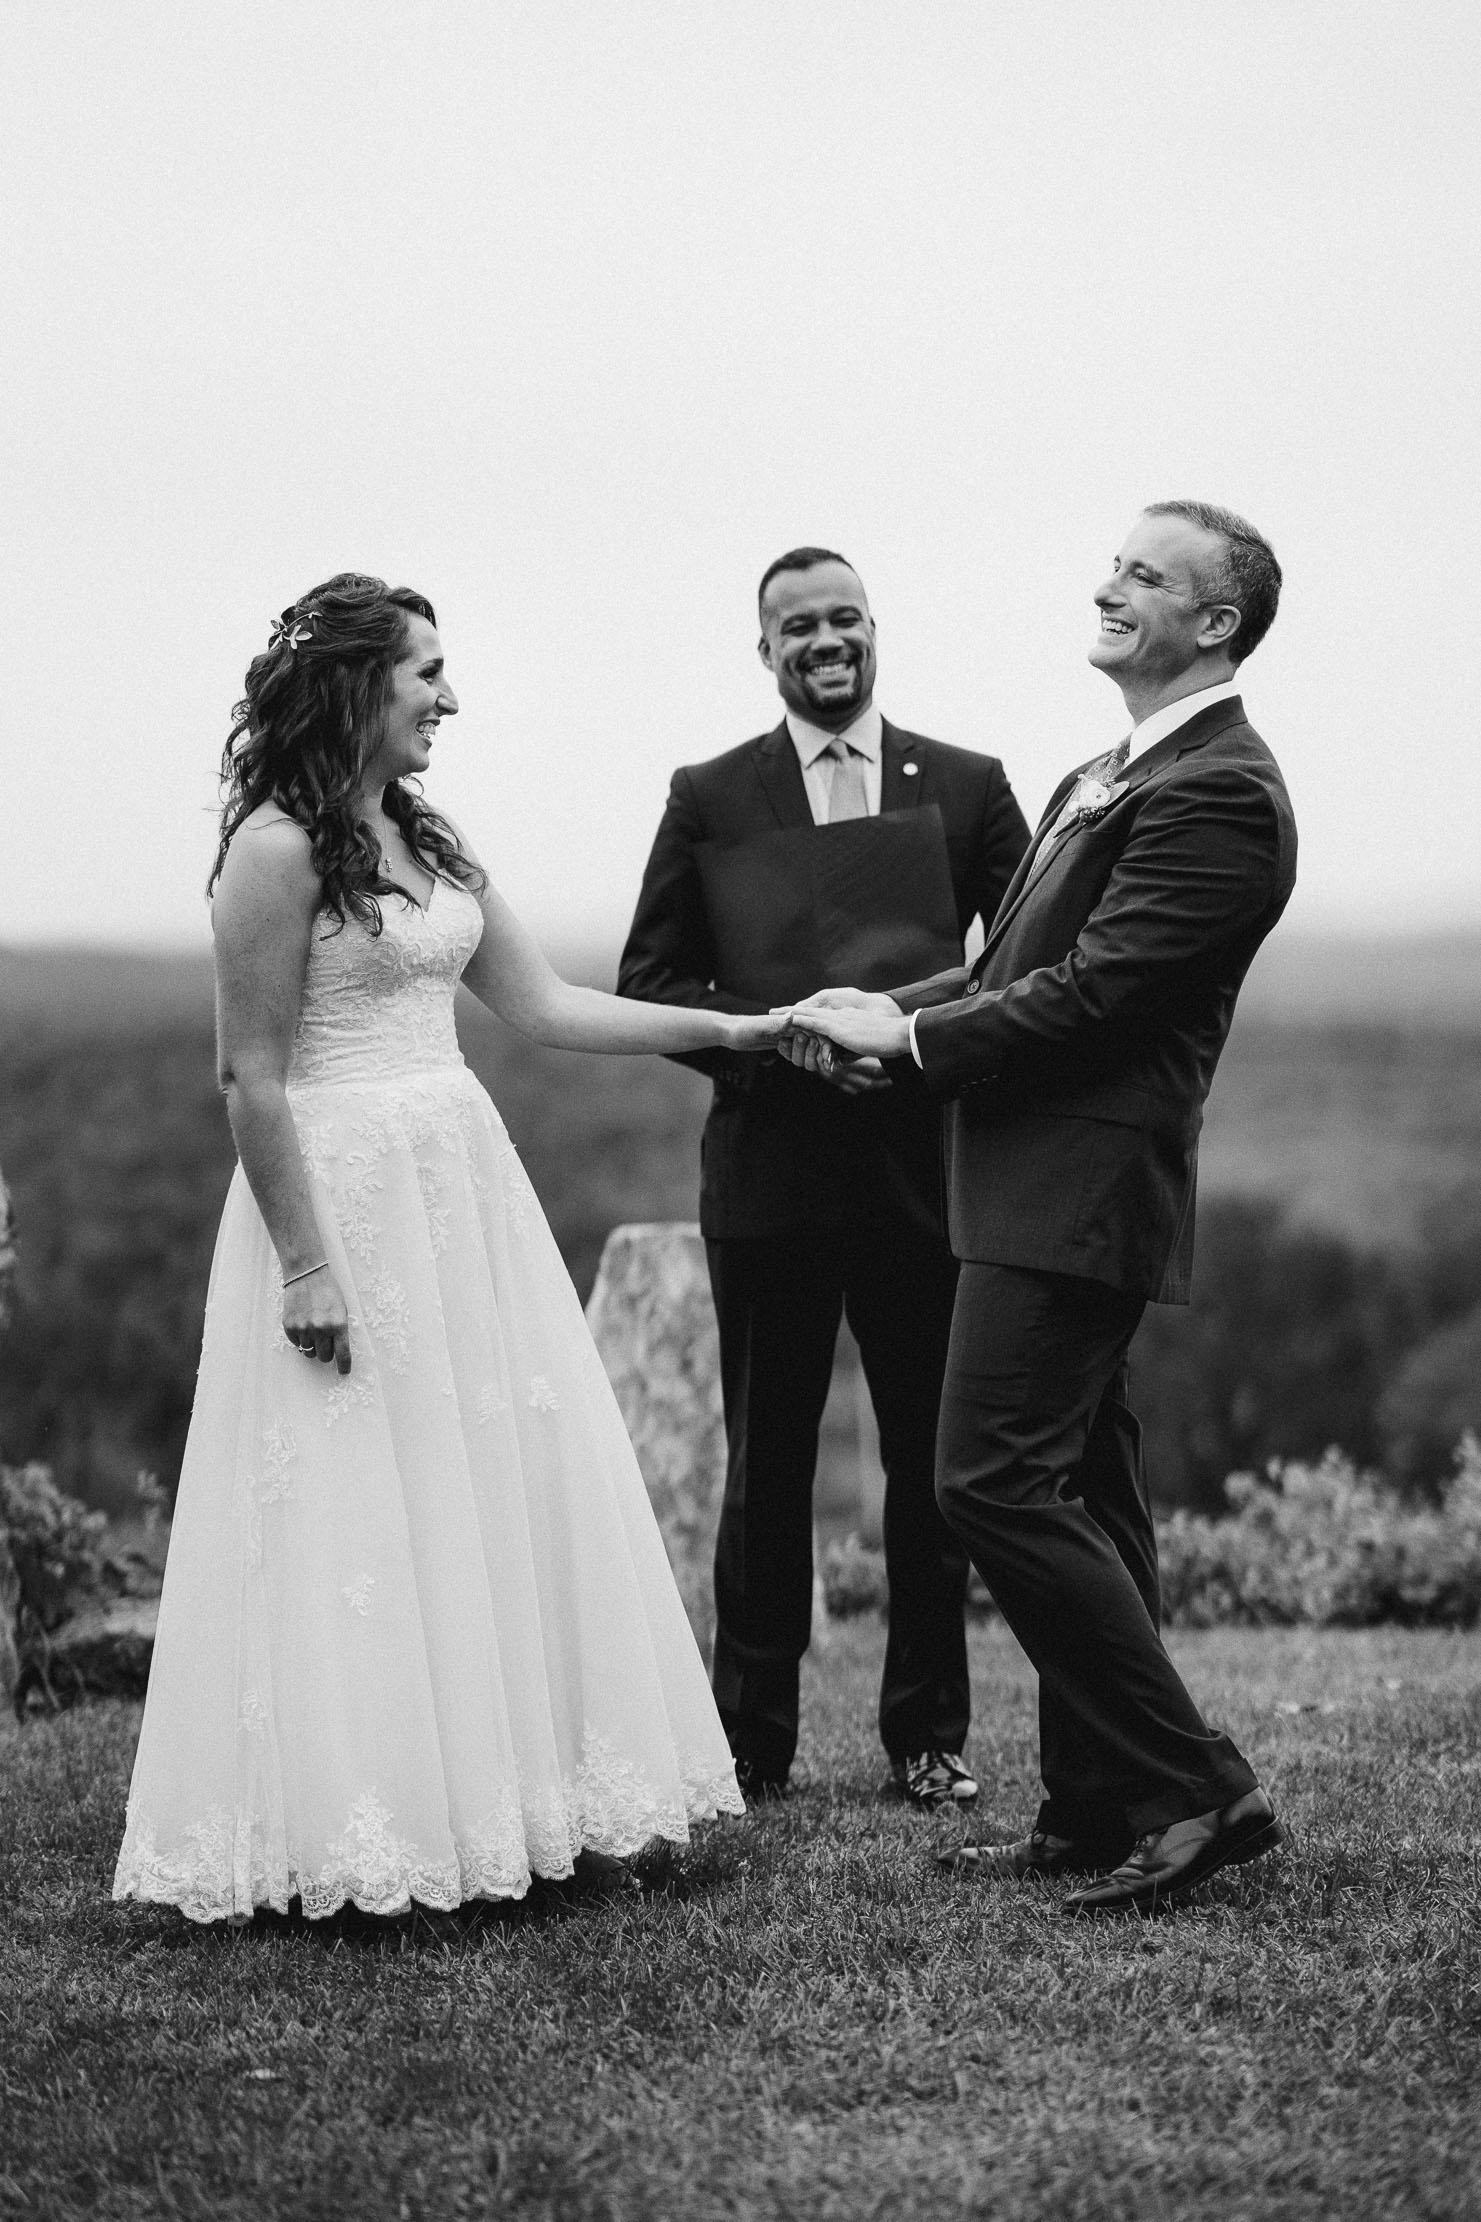 Wings-Castle-Millbrook-NY-Upstate-Wedding-Photographer-1088.jpg